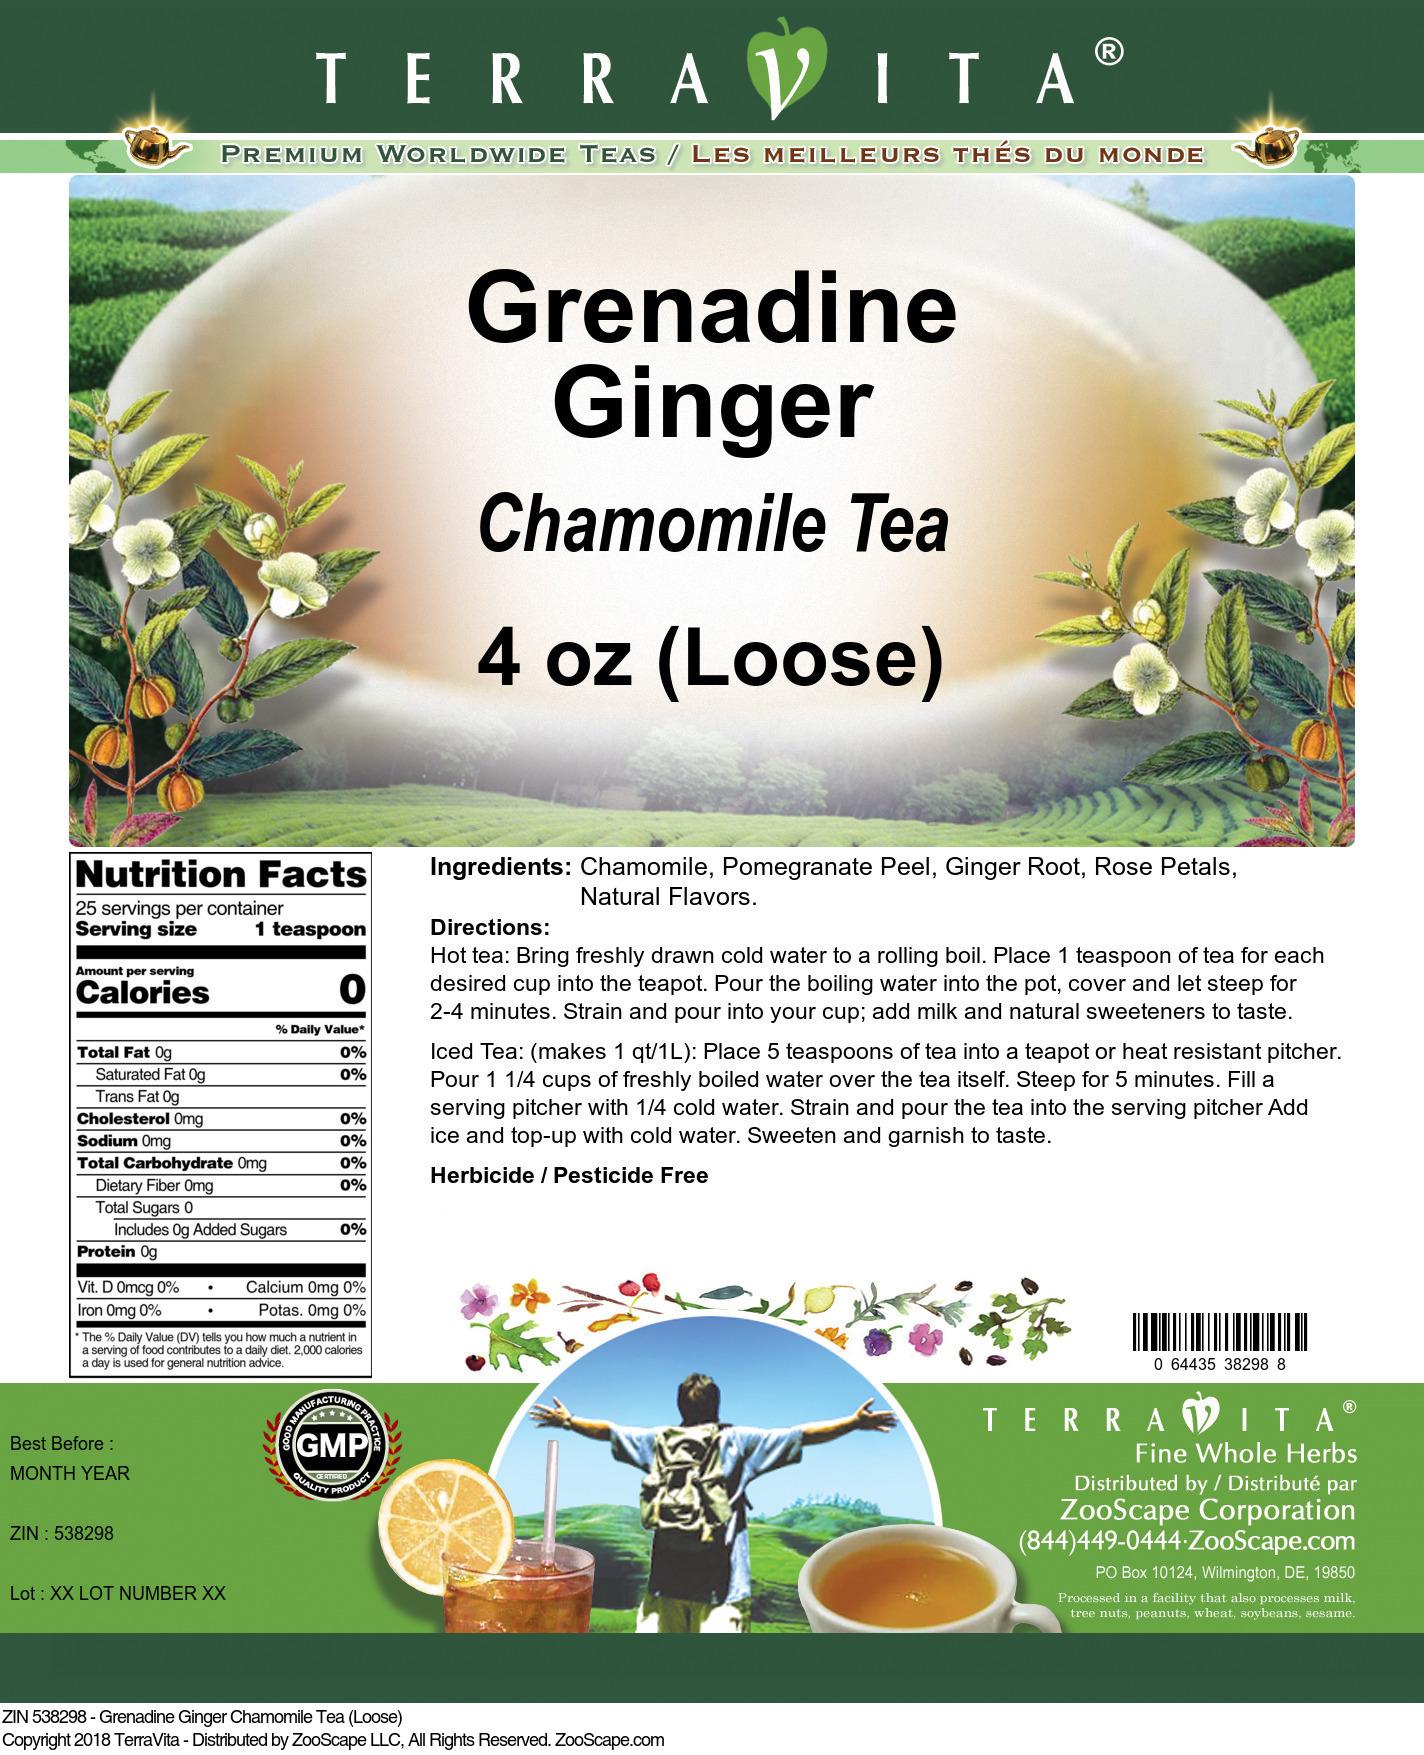 Grenadine Ginger Chamomile Tea (Loose)